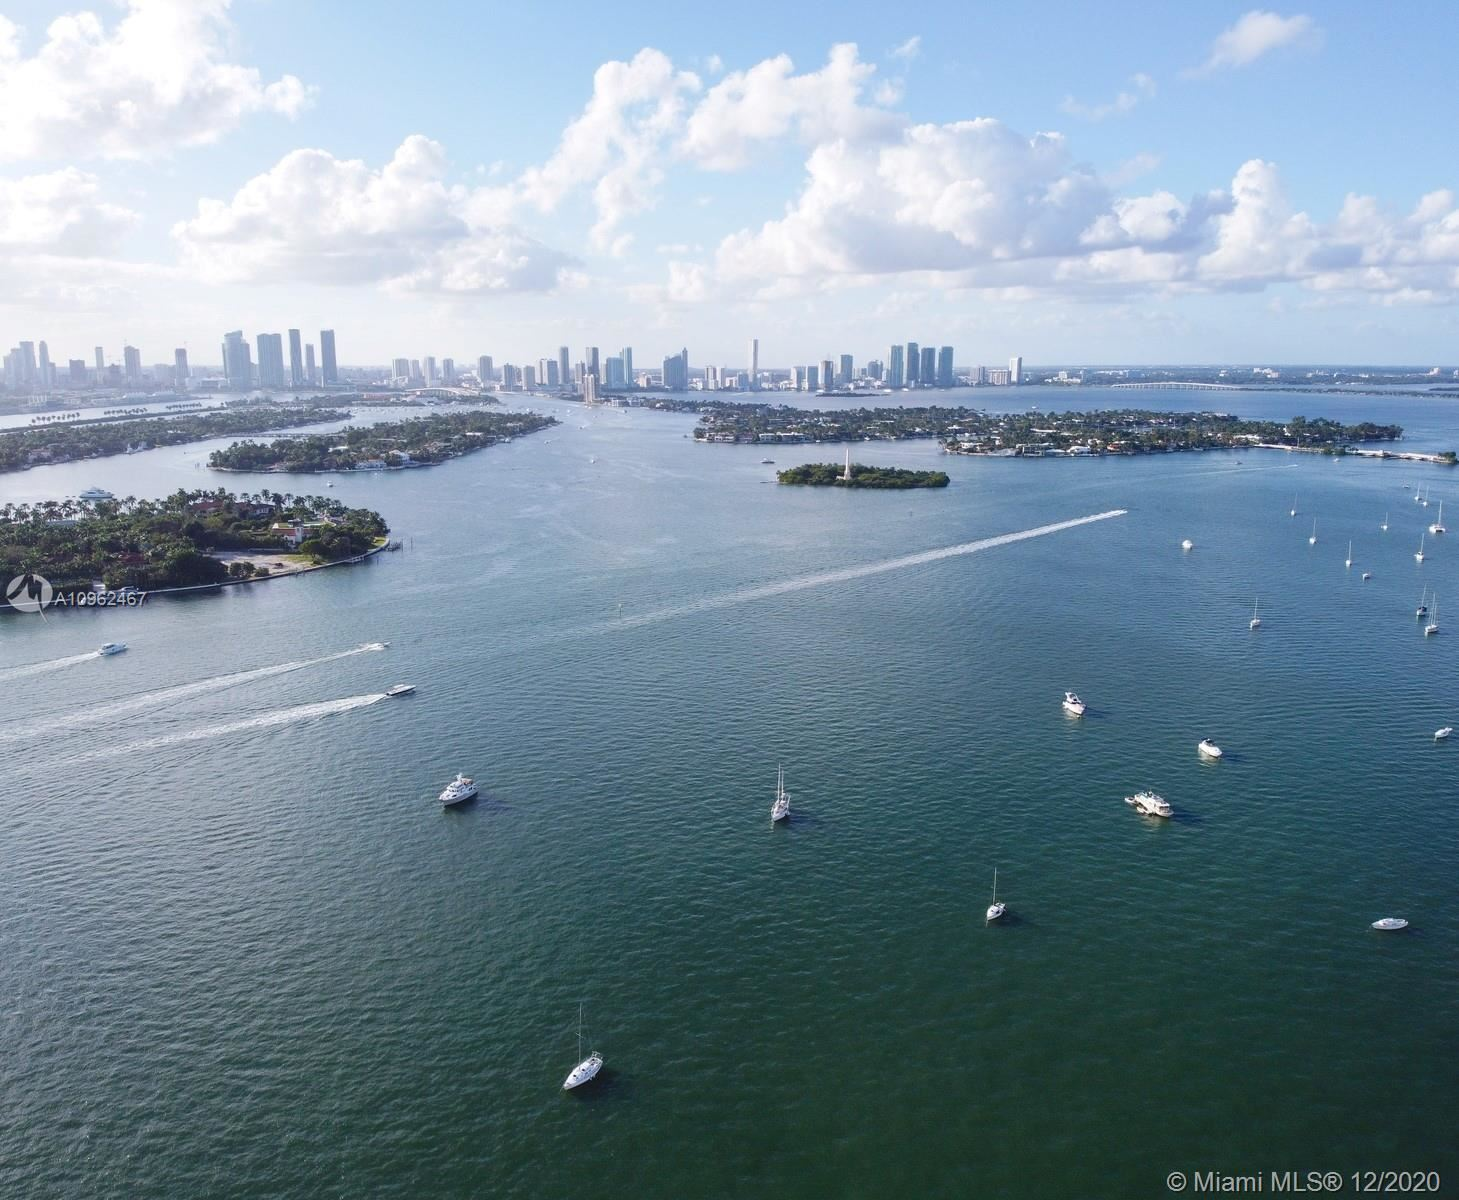 1035 West Ave #303, Miami Beach, FL 33139 - #: A10962467